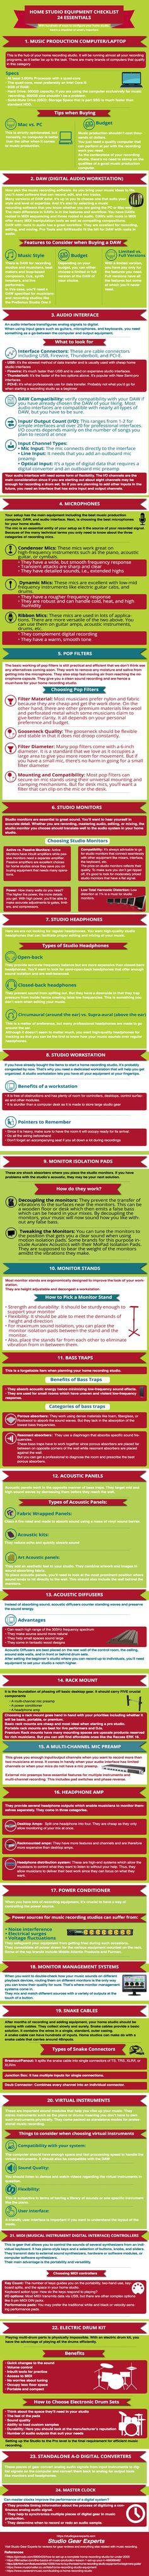 Home Recording Studio Equipment Checklist